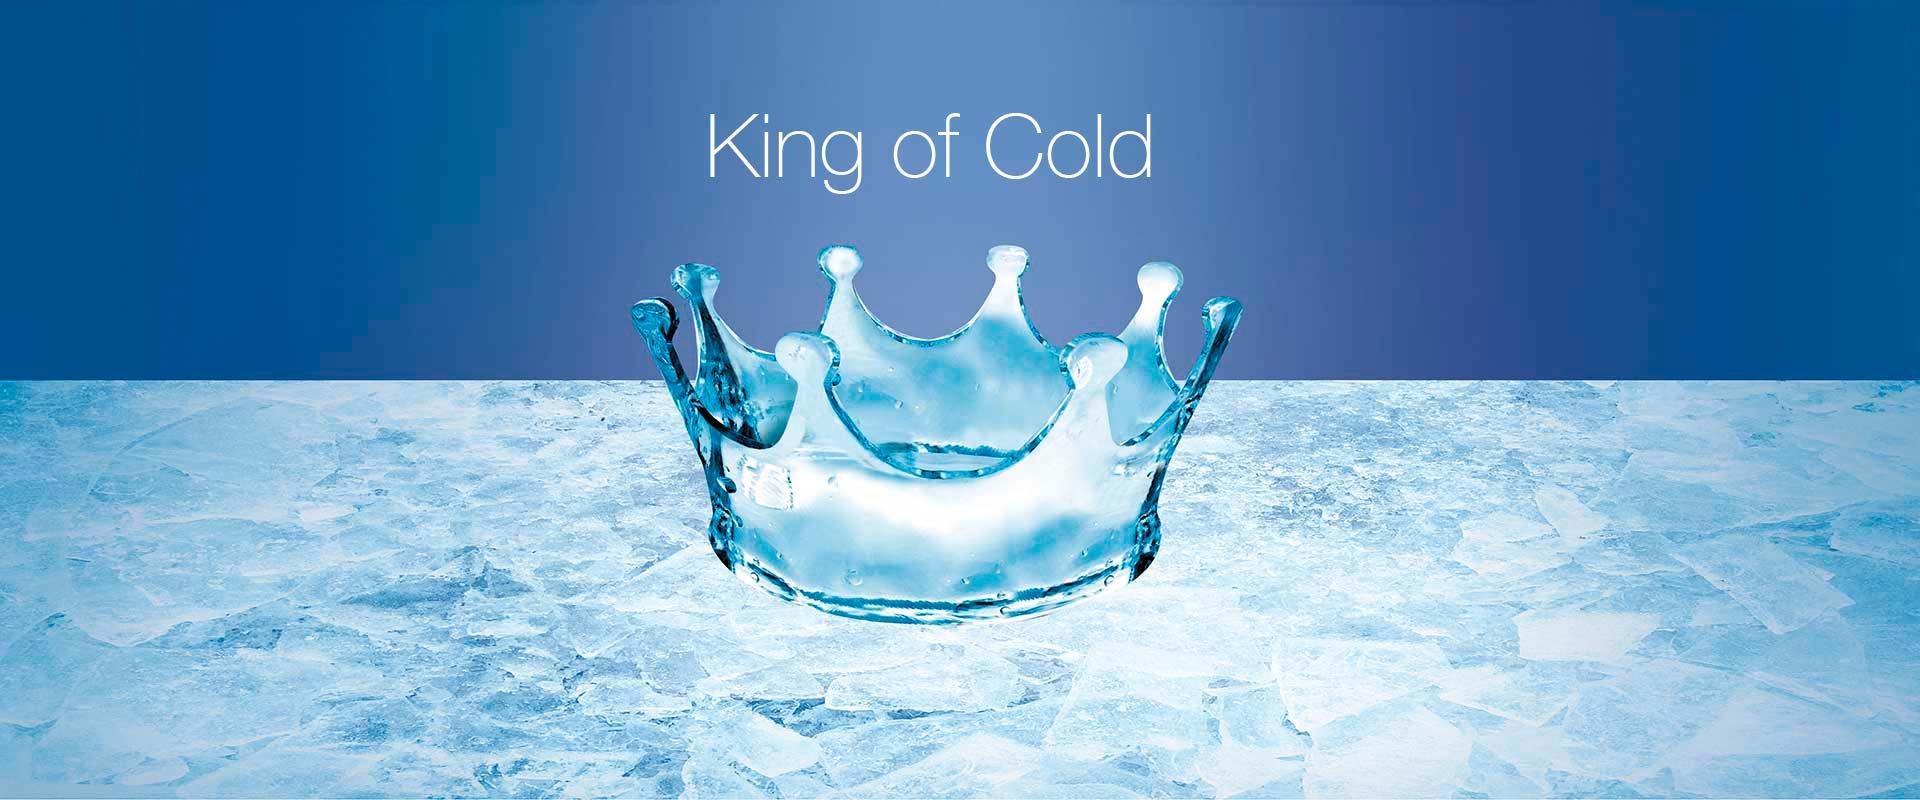 Zanotti rey del frío